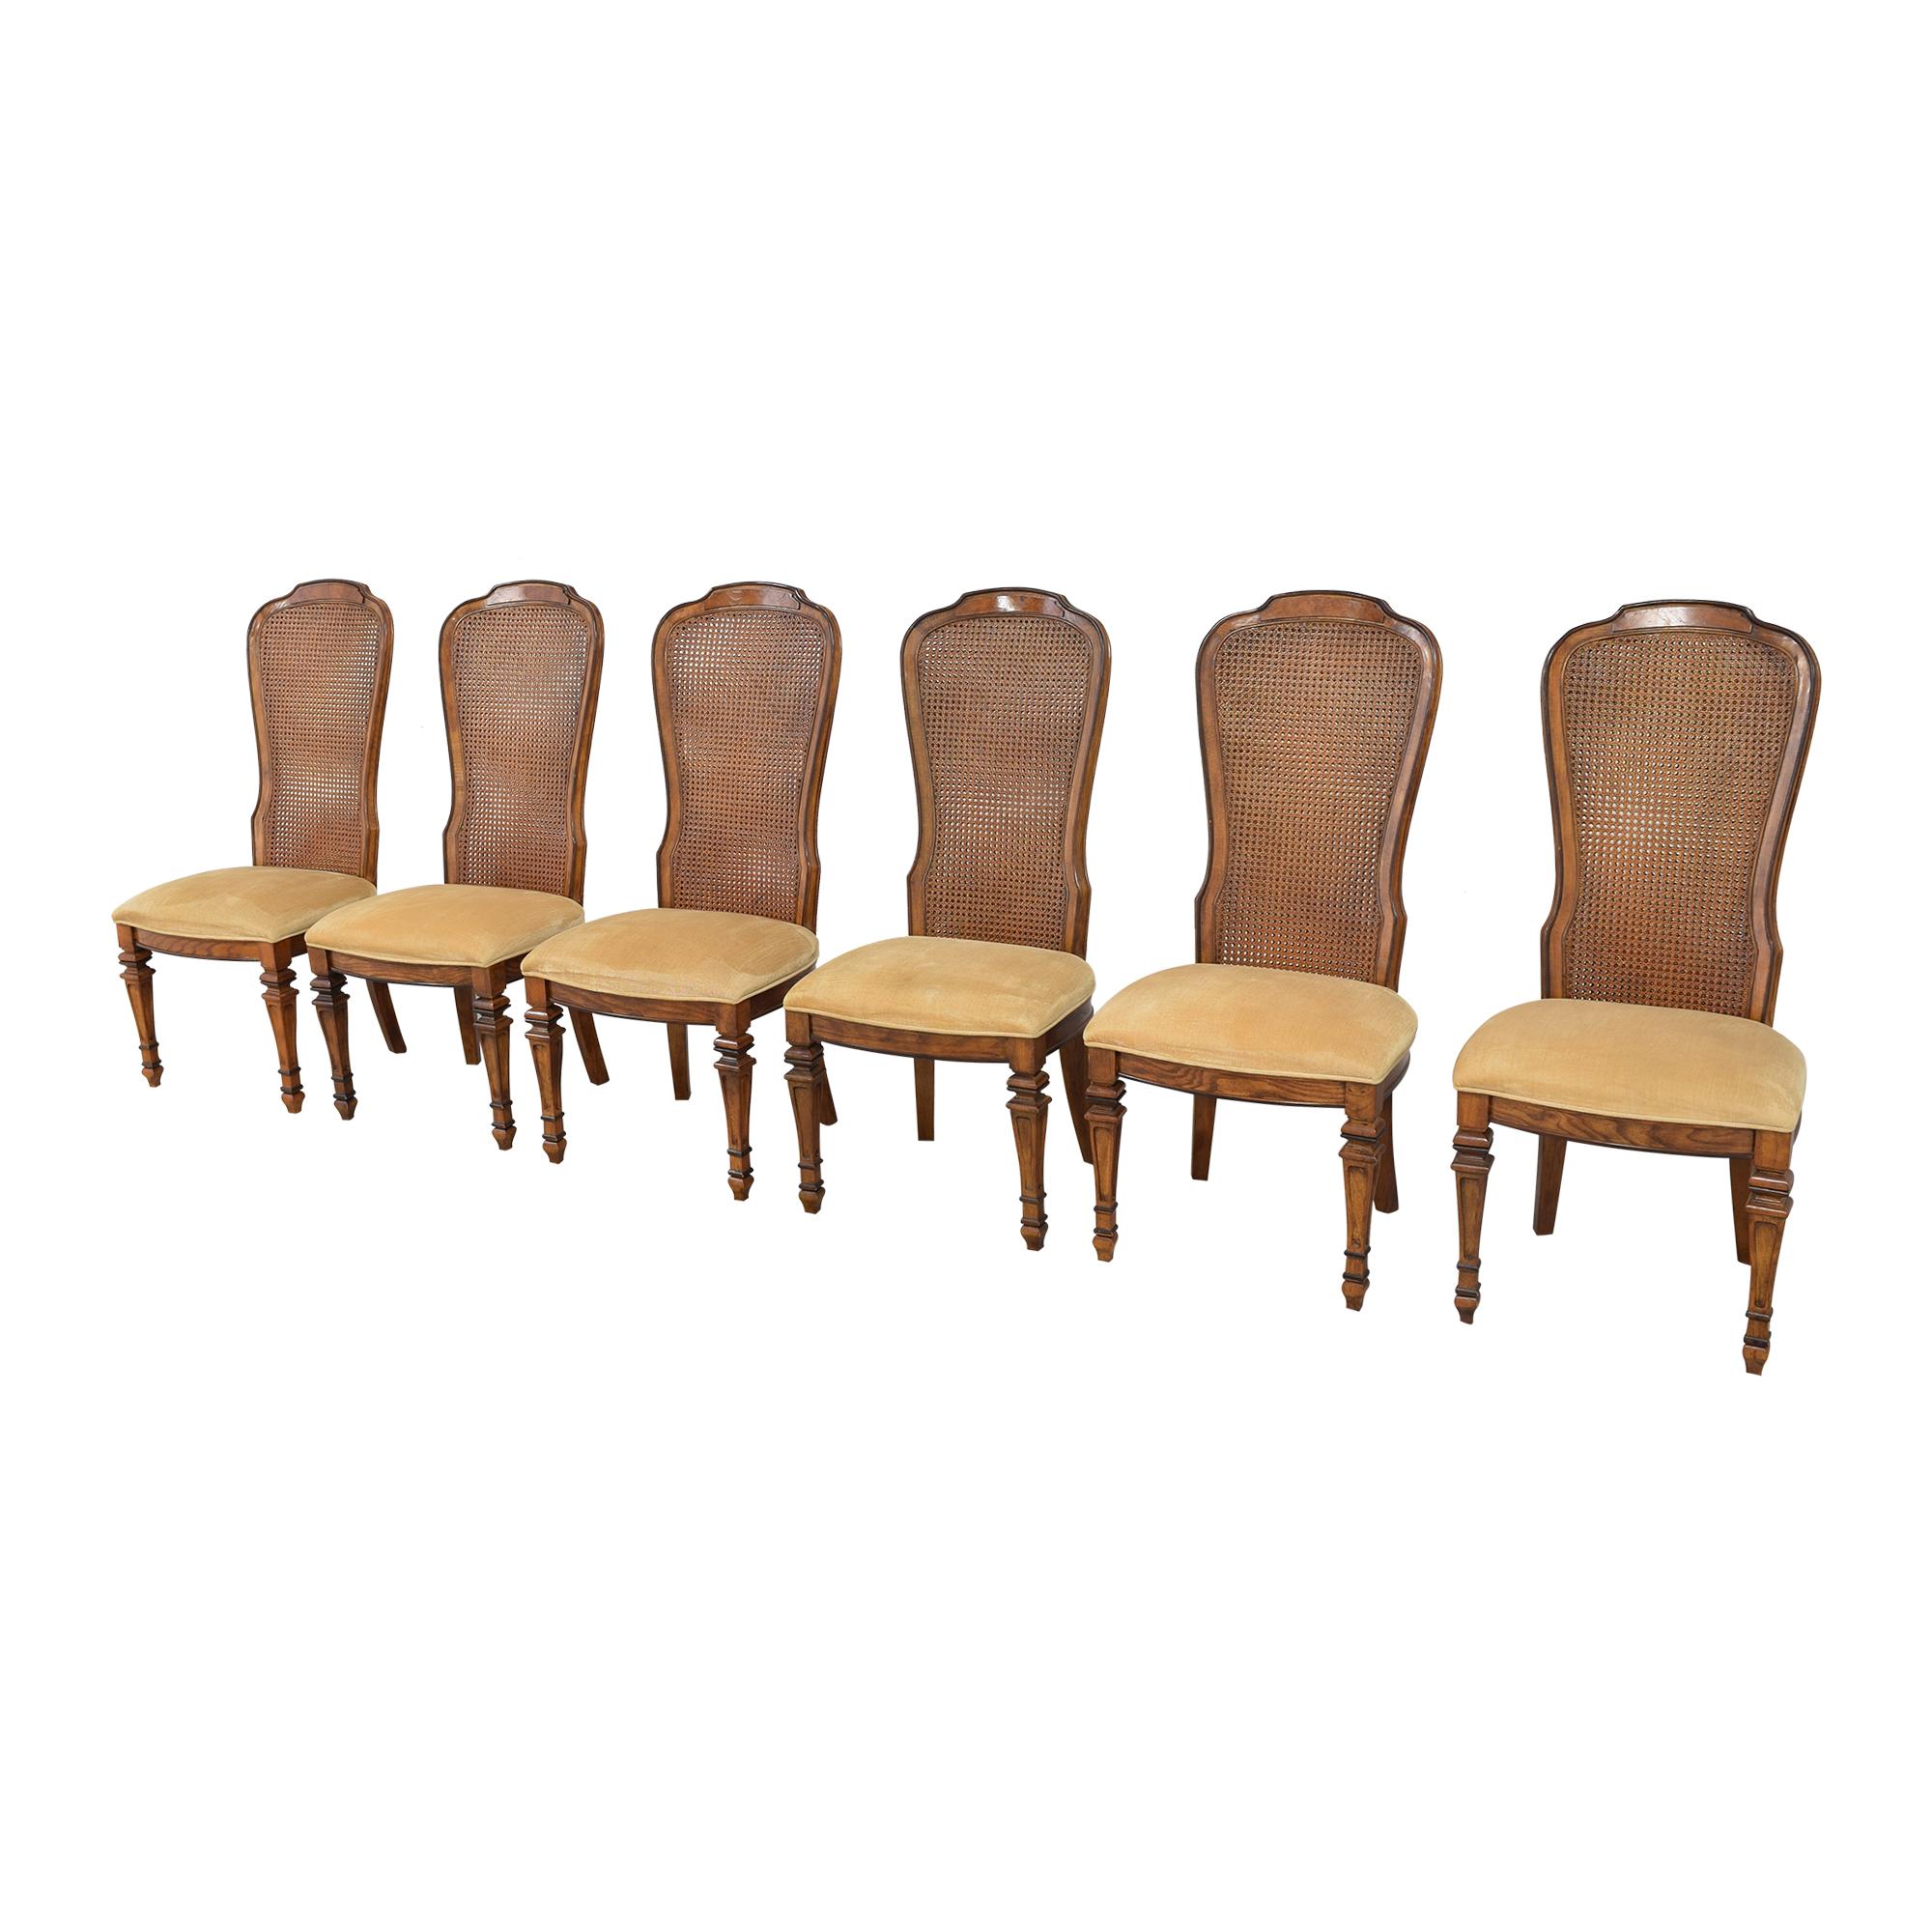 Bernhardt Bernhardt Upholstered Dining Chairs nyc